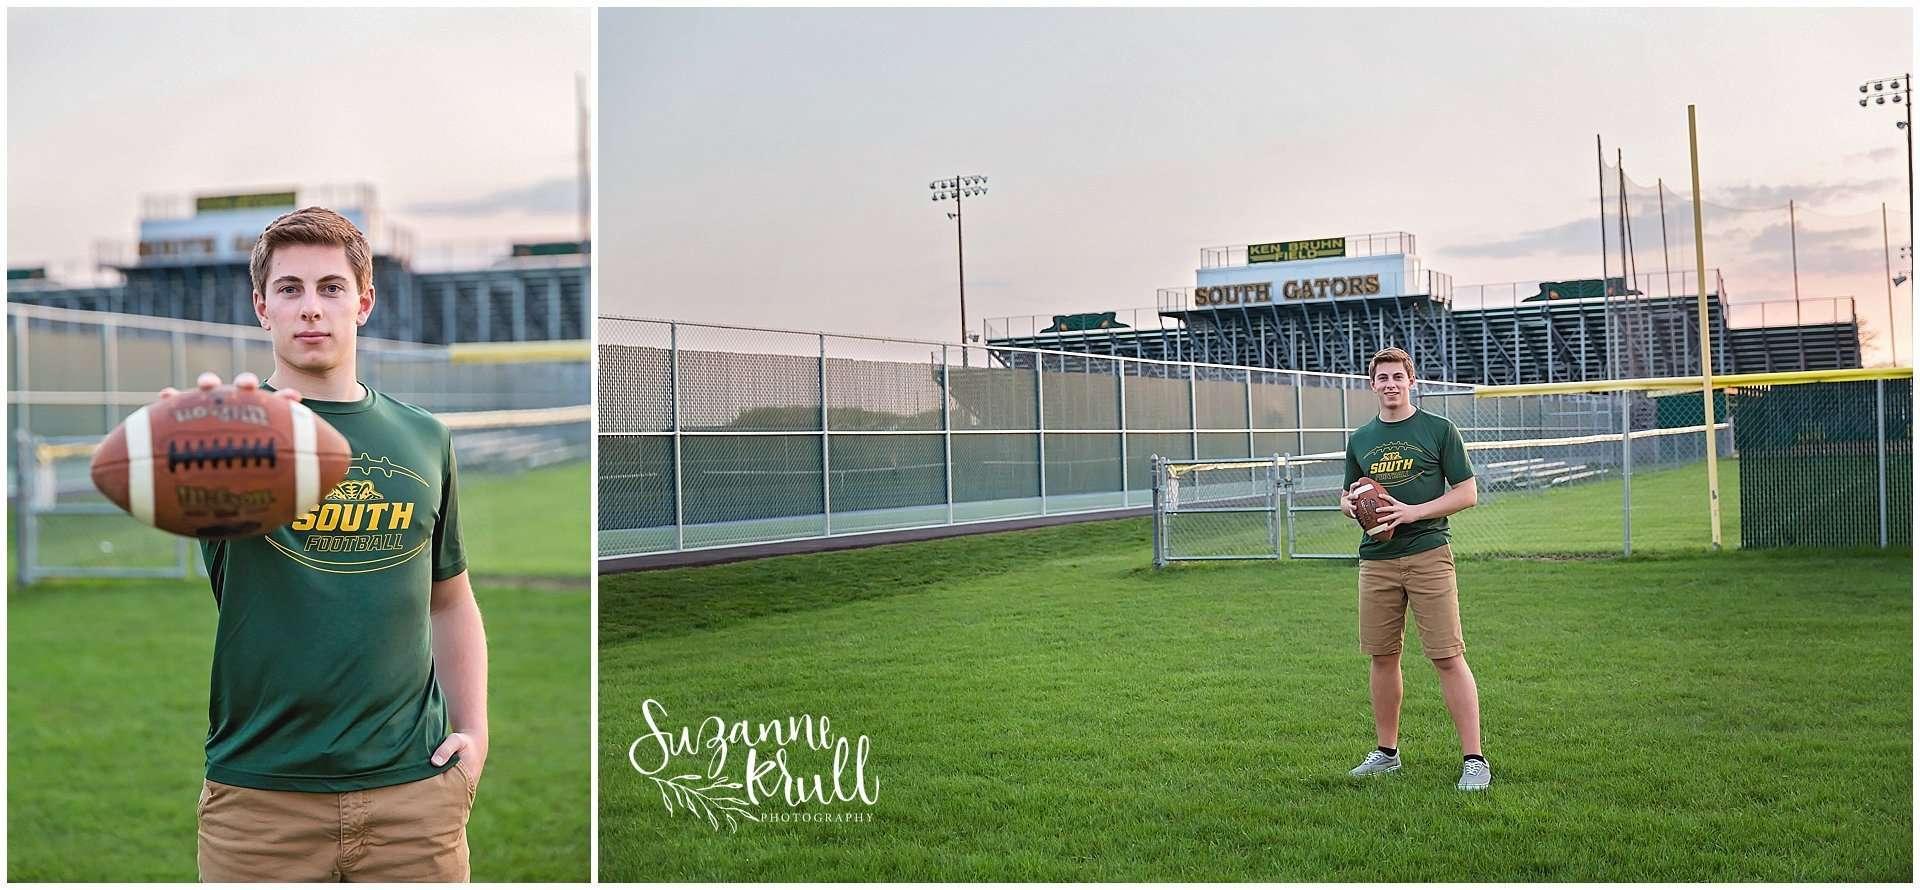 Senior photos, crystal Lake South High School, Crystal Lake IL, Senior Photographer near me, Senior portraits, senior photographer